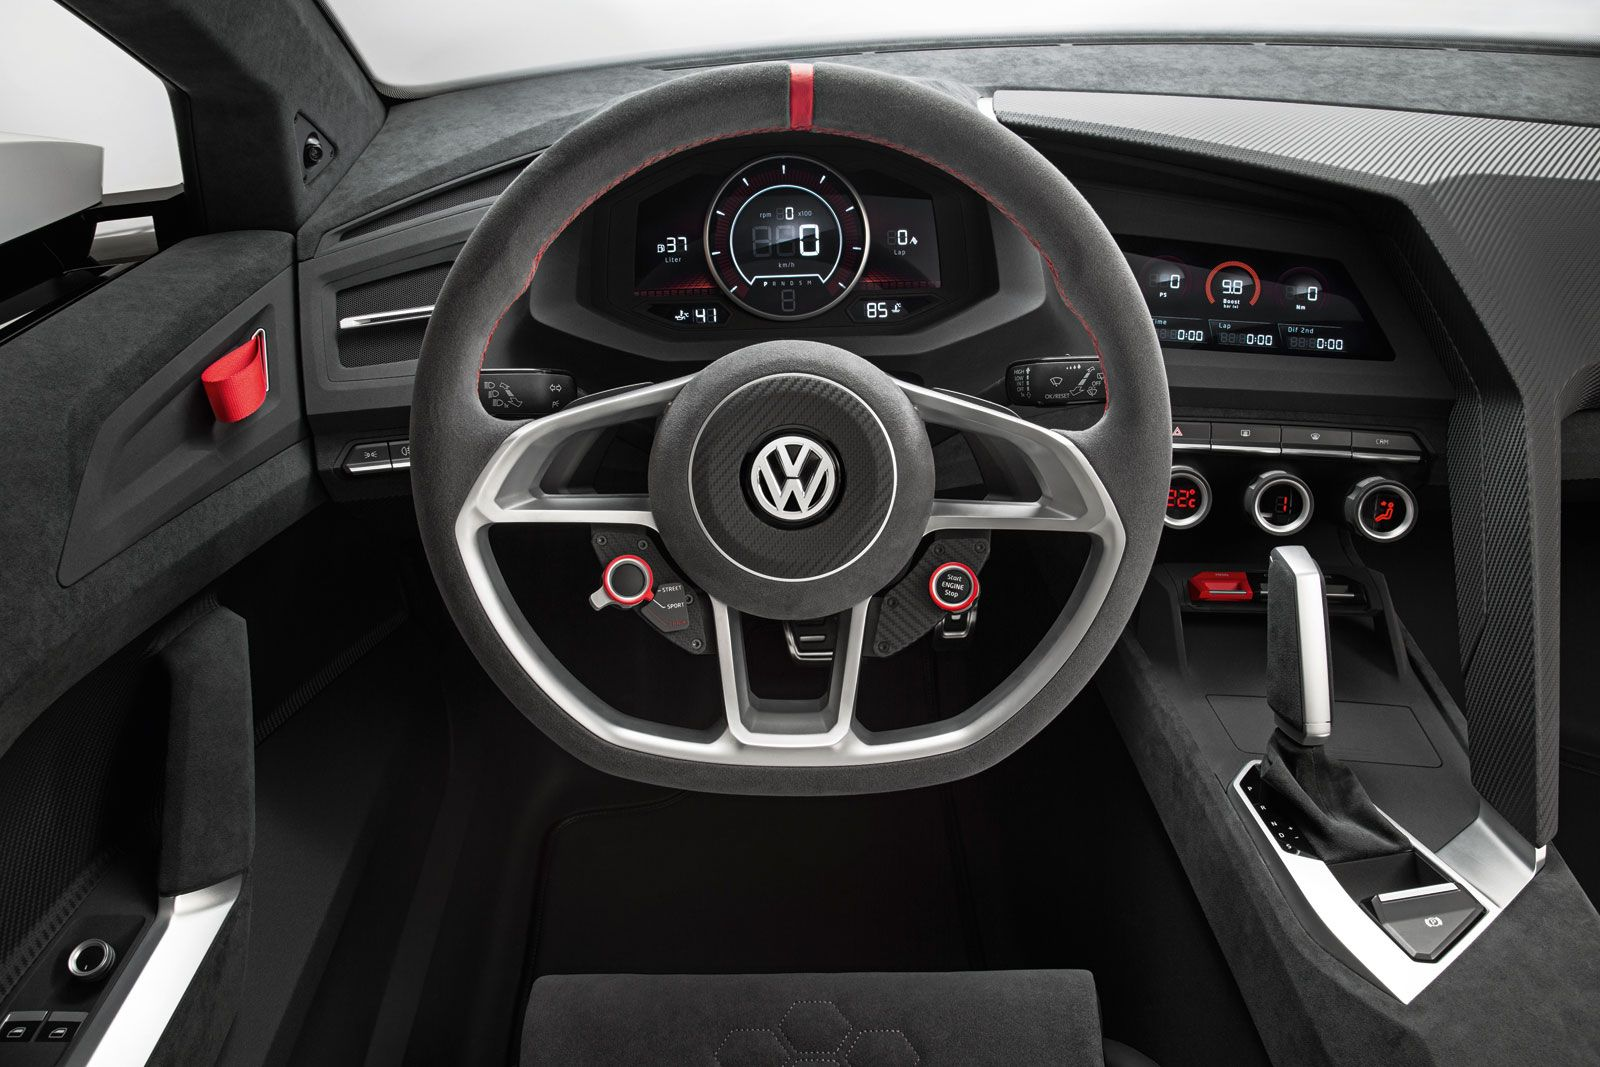 Volkswagen Design Vision Gti Concept Interior Volkswagen Gti